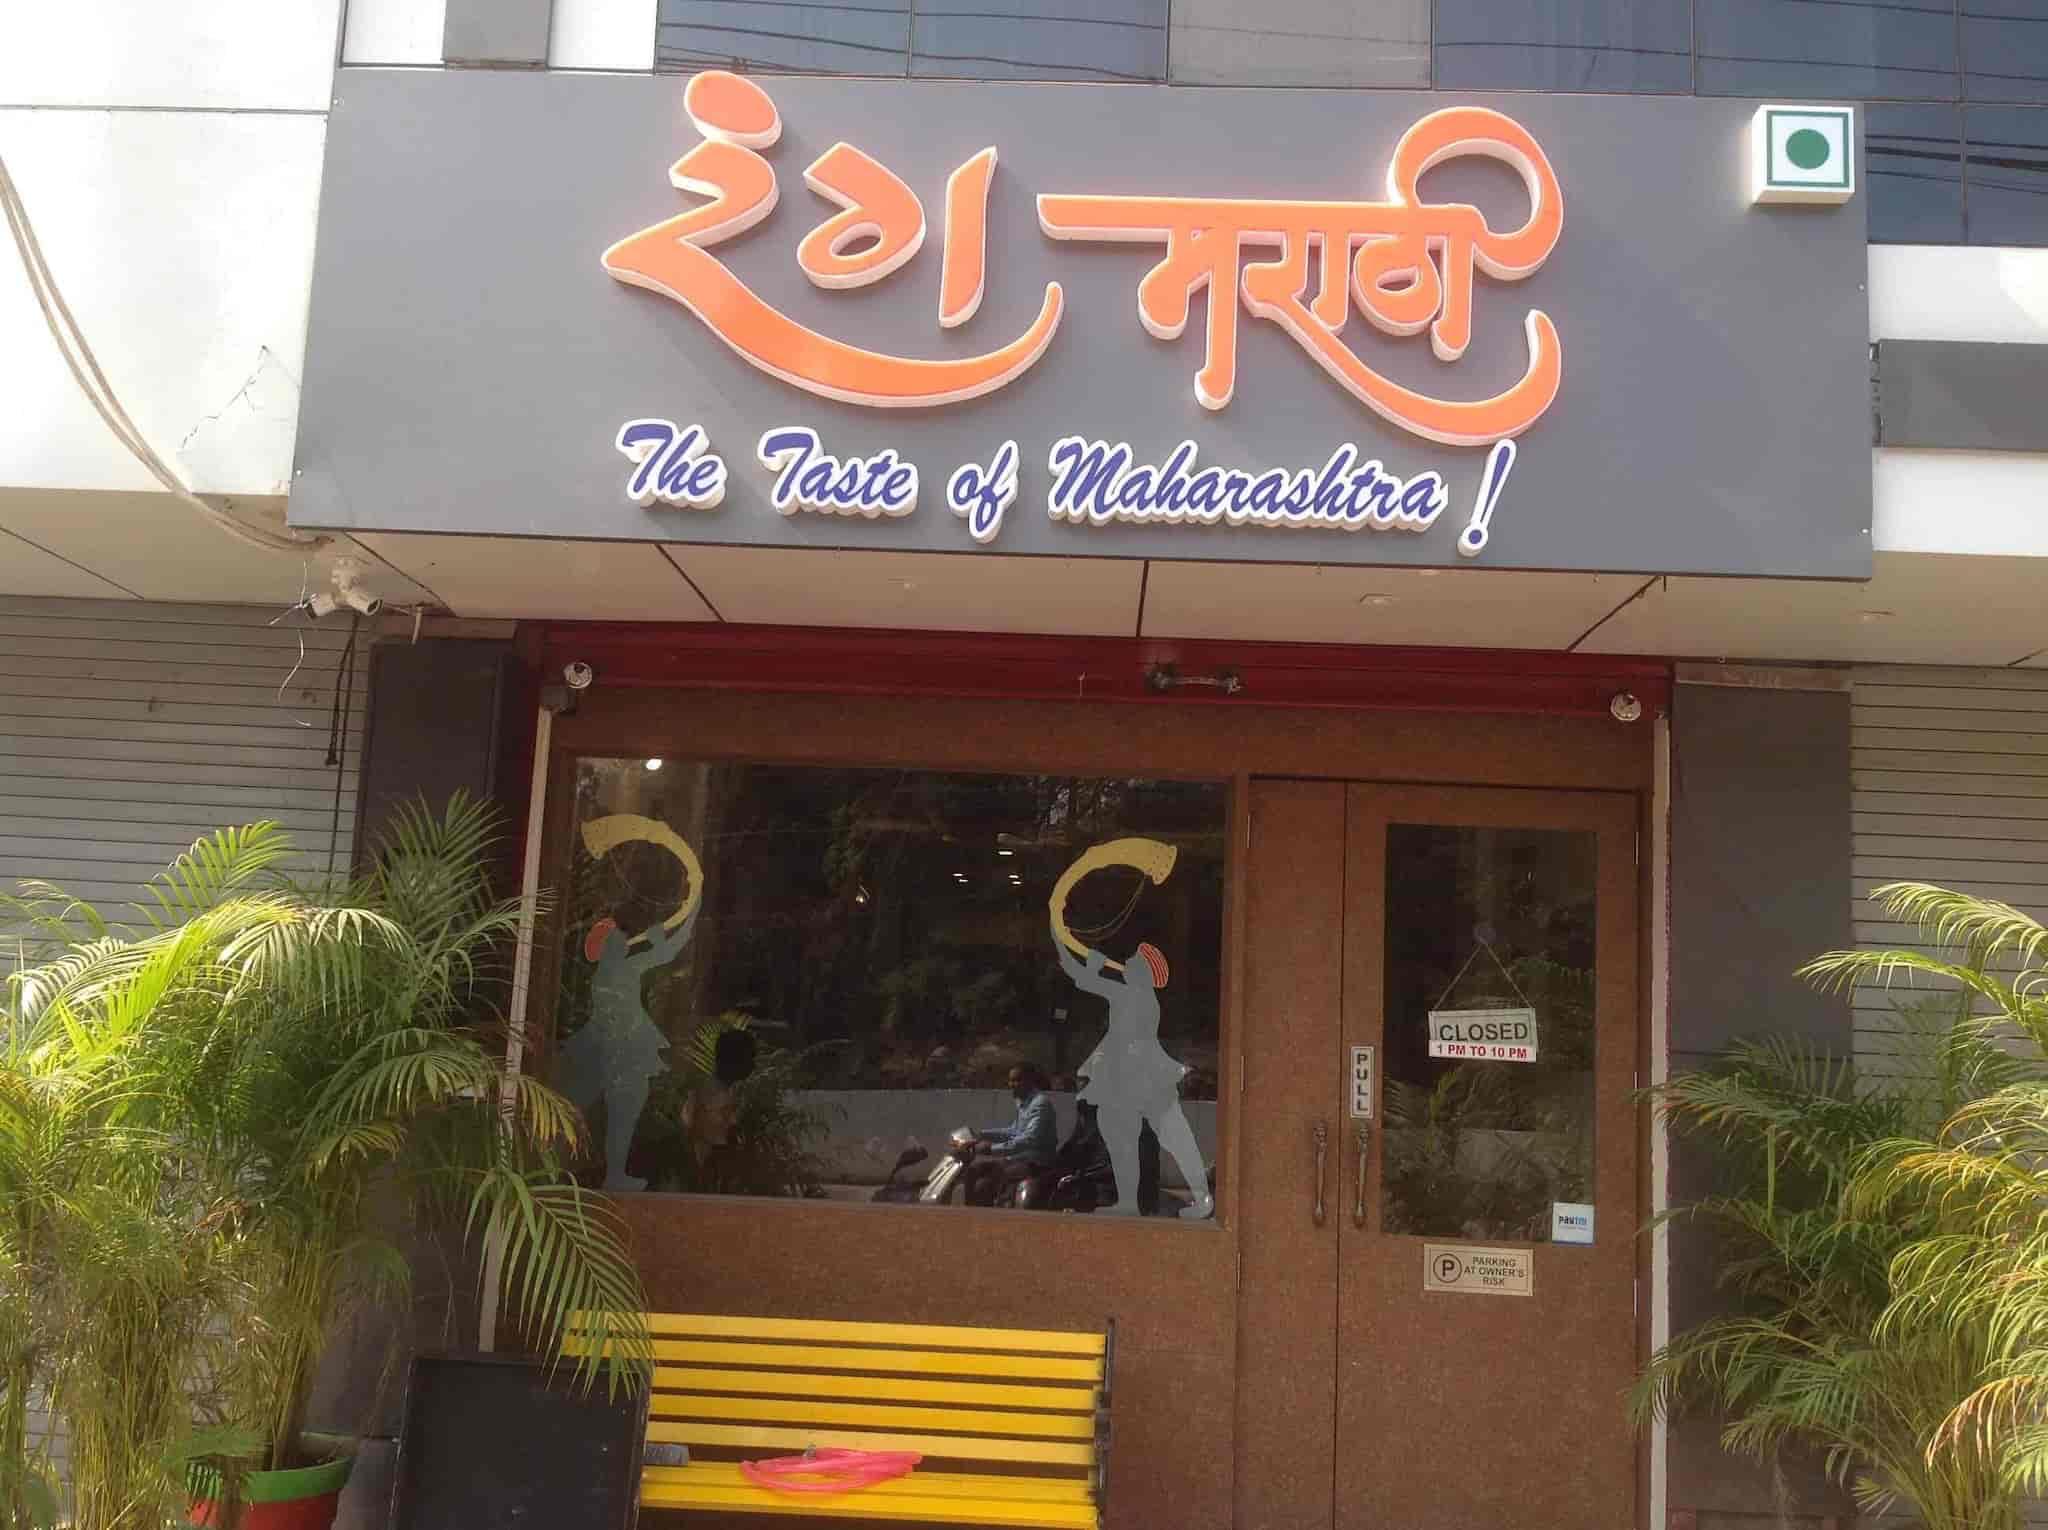 Rang Marathi Restaurant, Kesar Baug Road, Indore